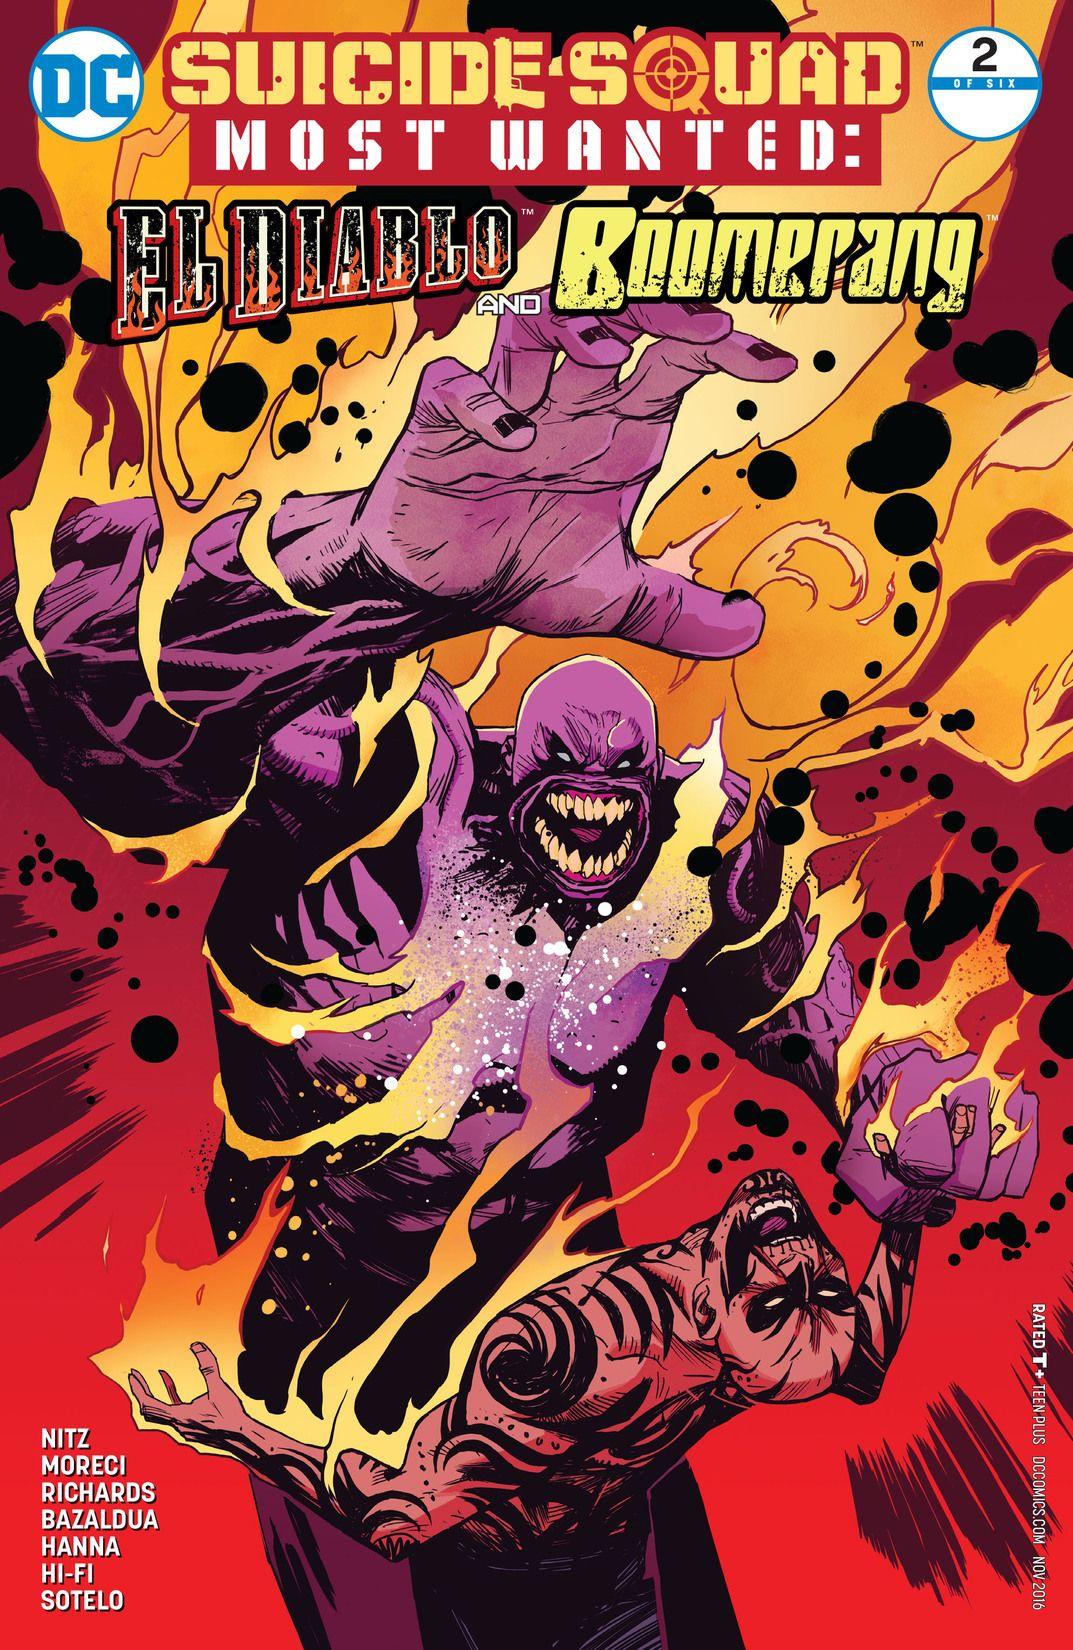 Suicide Squad Most Wanted: El Diablo and Boomerang Vol 1 2